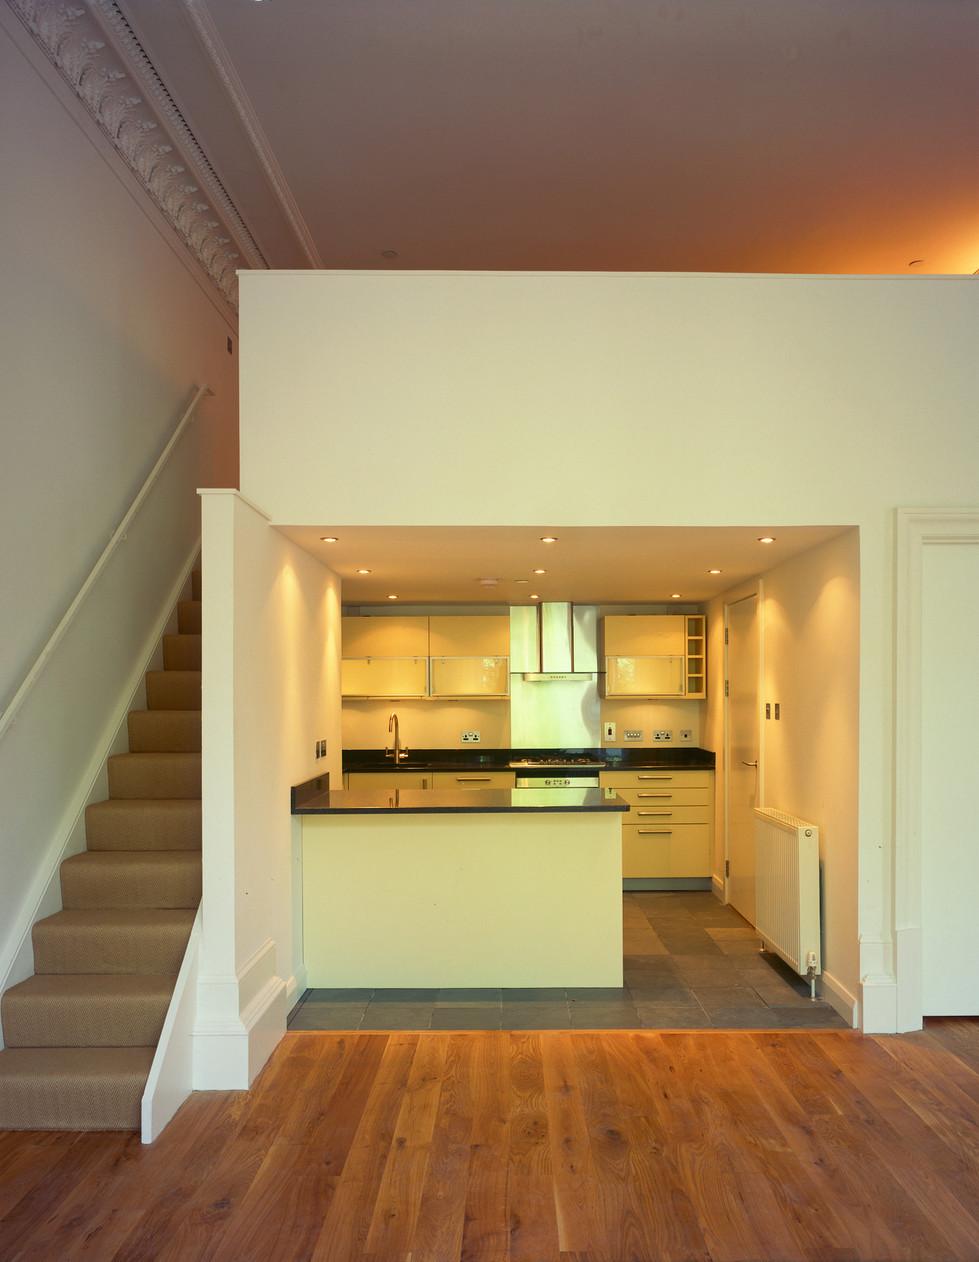 1st floor kitchen-mezz.jpg